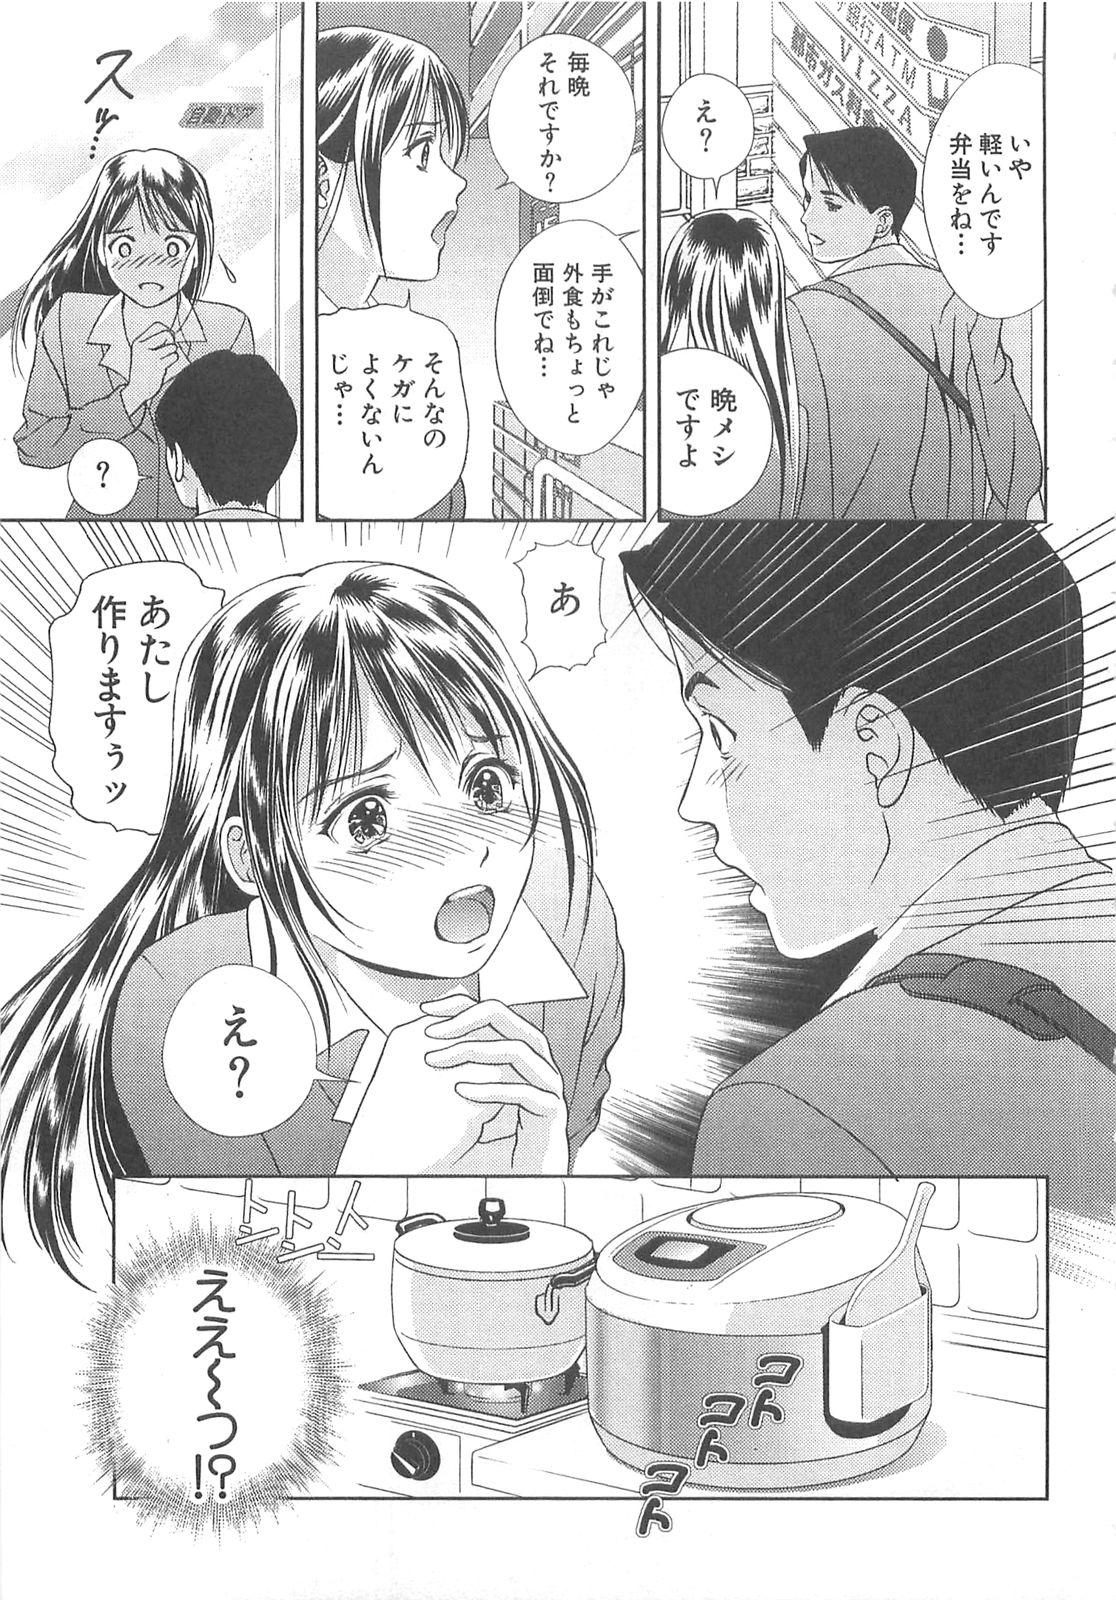 Tenshi no Kyuu - Angel's Pretty Hip 53